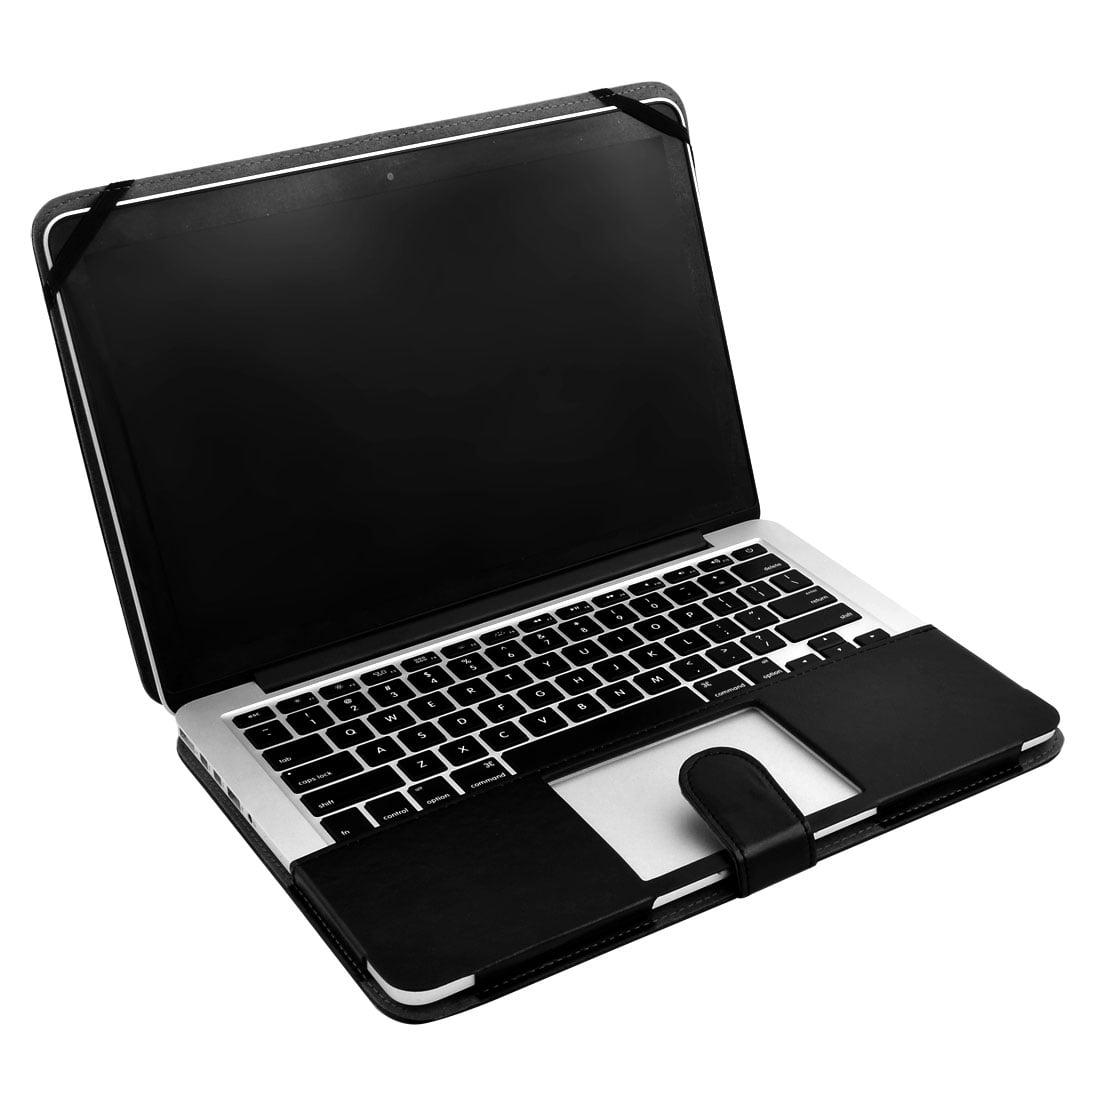 PU Leather PC Laptop Cover Clip On Folio Case Black for Macbook Retina 13.3 Inch